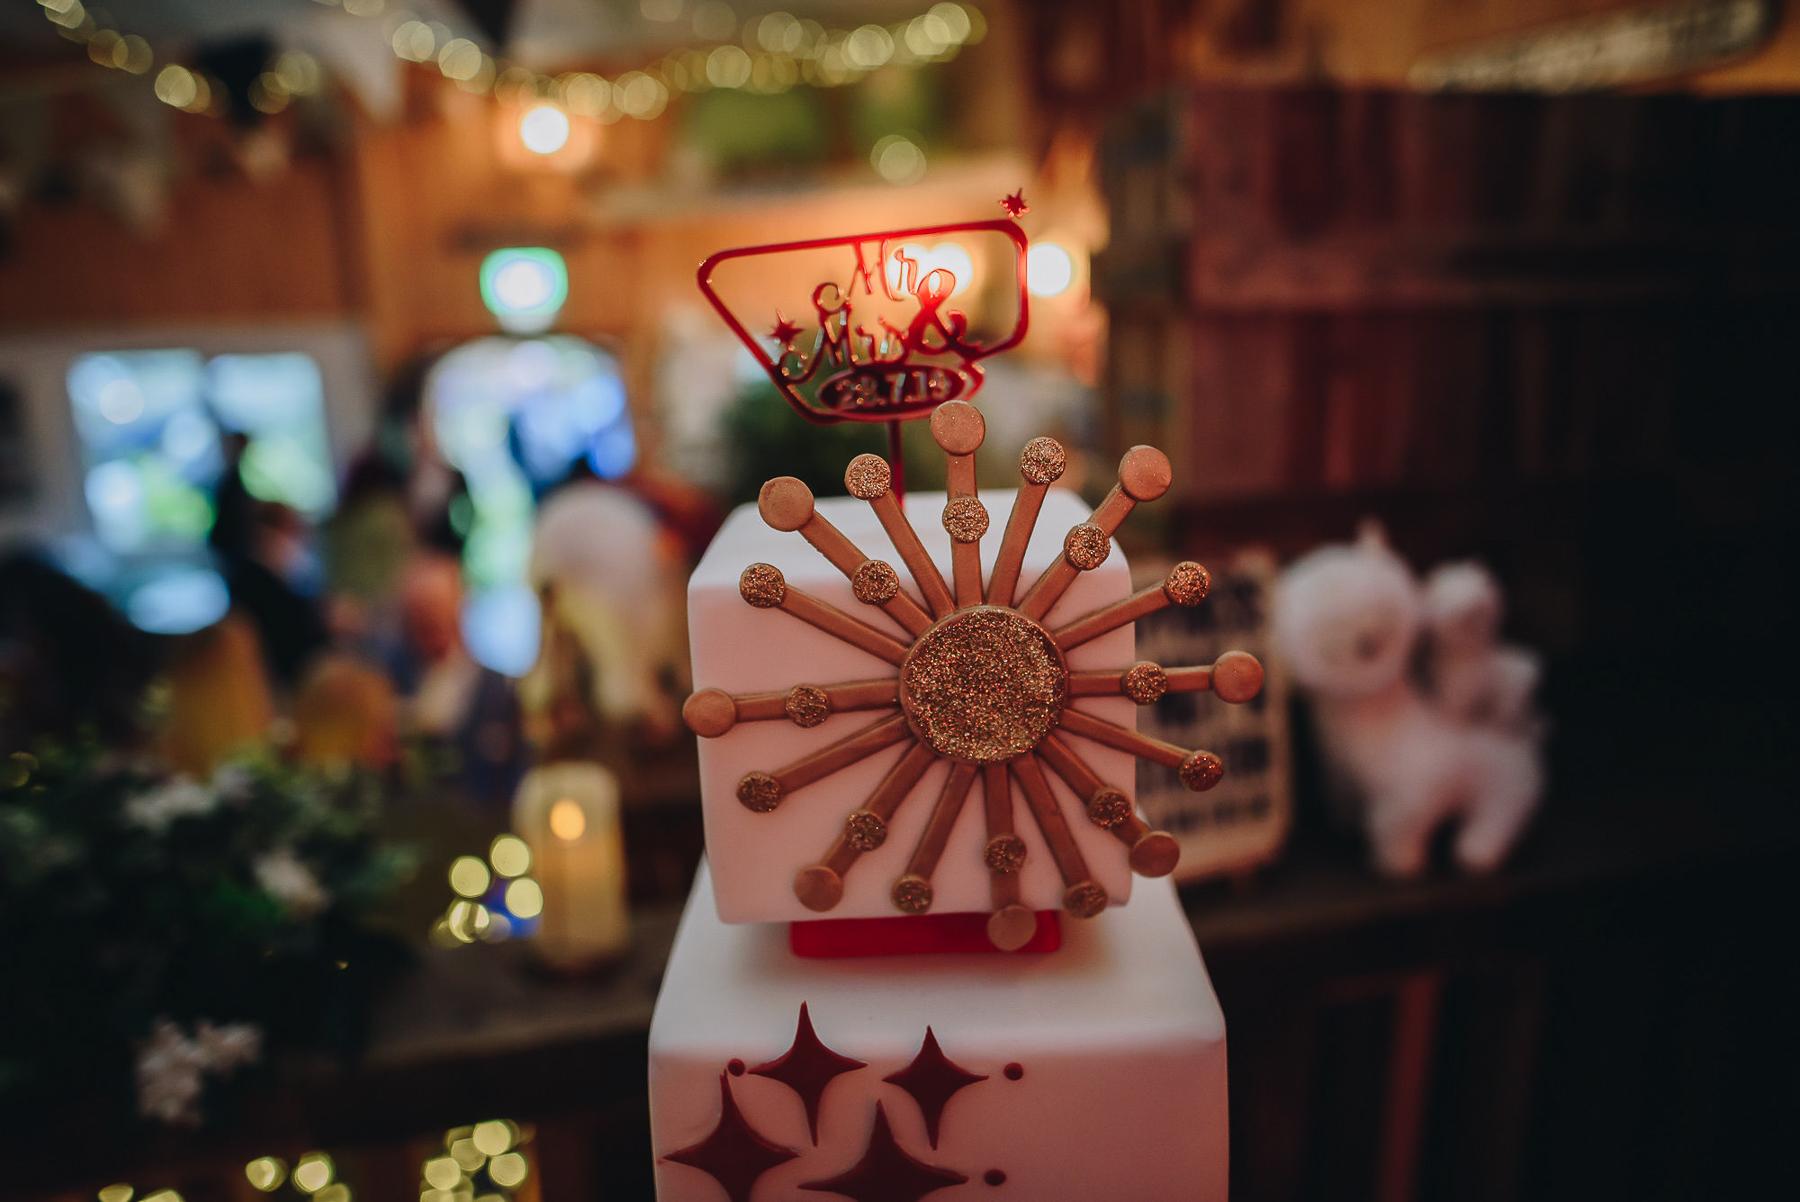 Wellbeing_Farm_Wedding_Photography_The_Pin-Up_Bride_Lara_Shaun-117.jpg